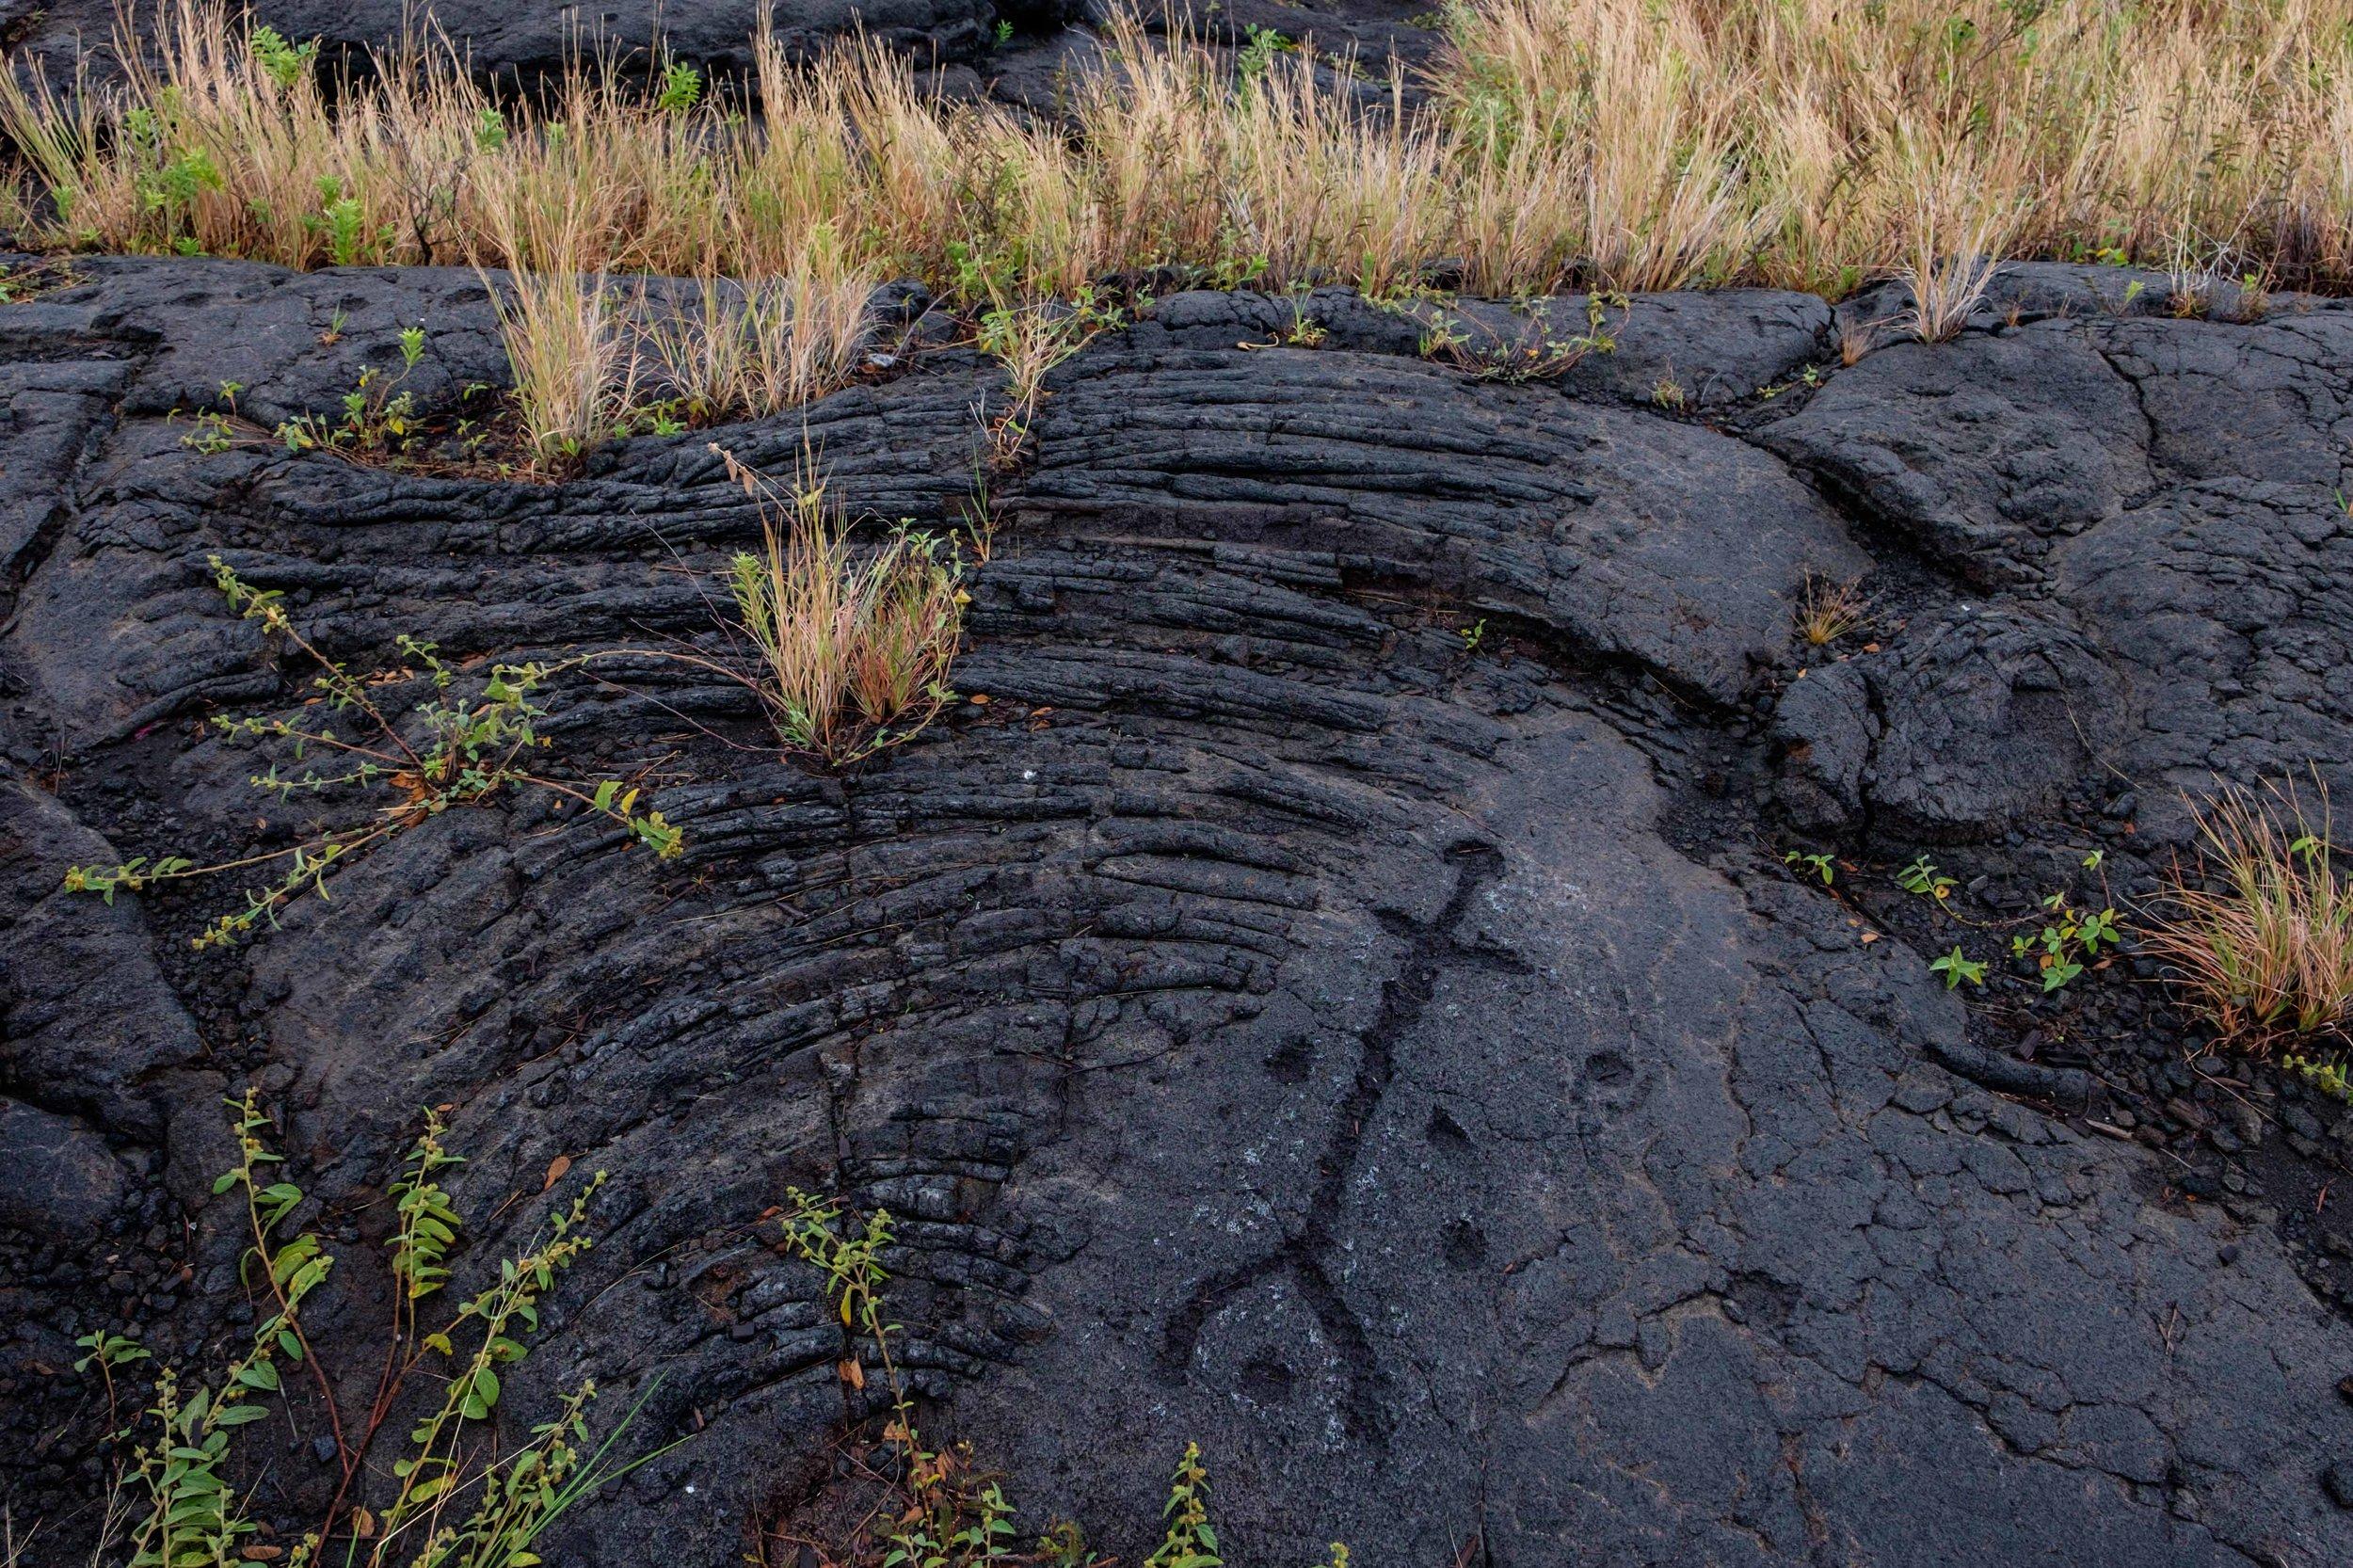 The ancient Pu'u Loa Petroglyphs.